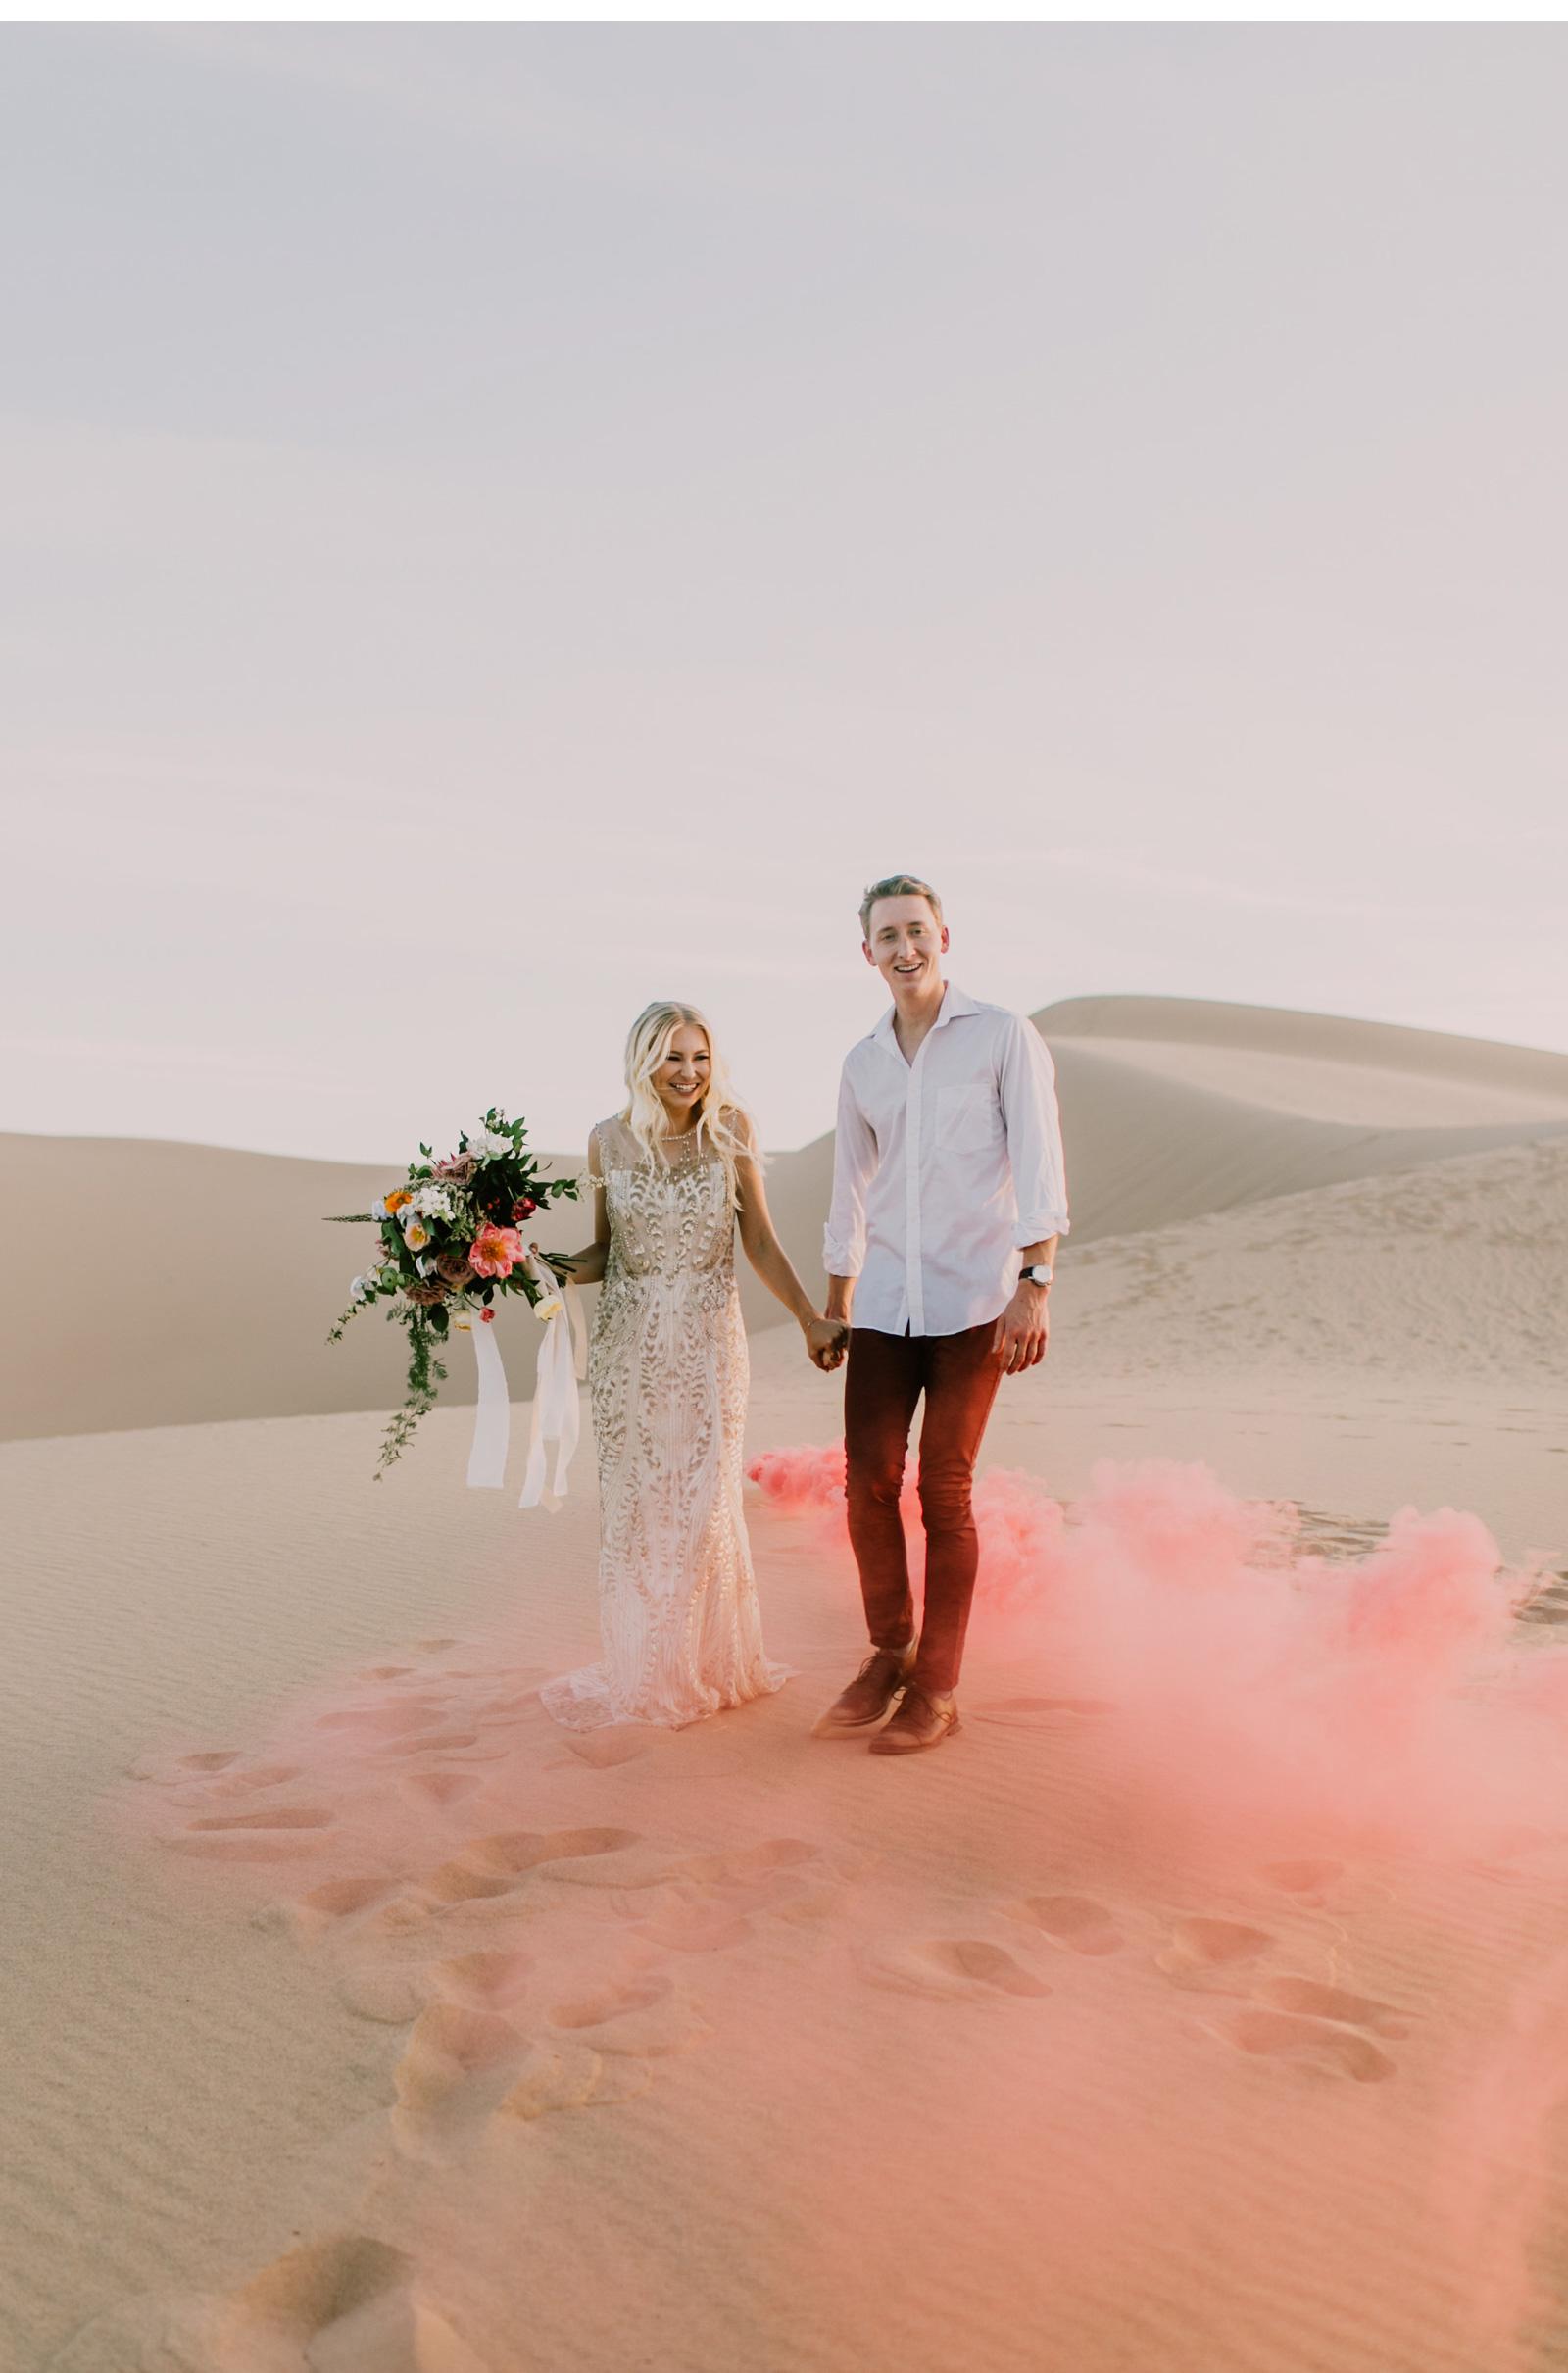 Desert-Wedding-Free-People-Wedding-Natalie-Schutt-Photography_03.jpg